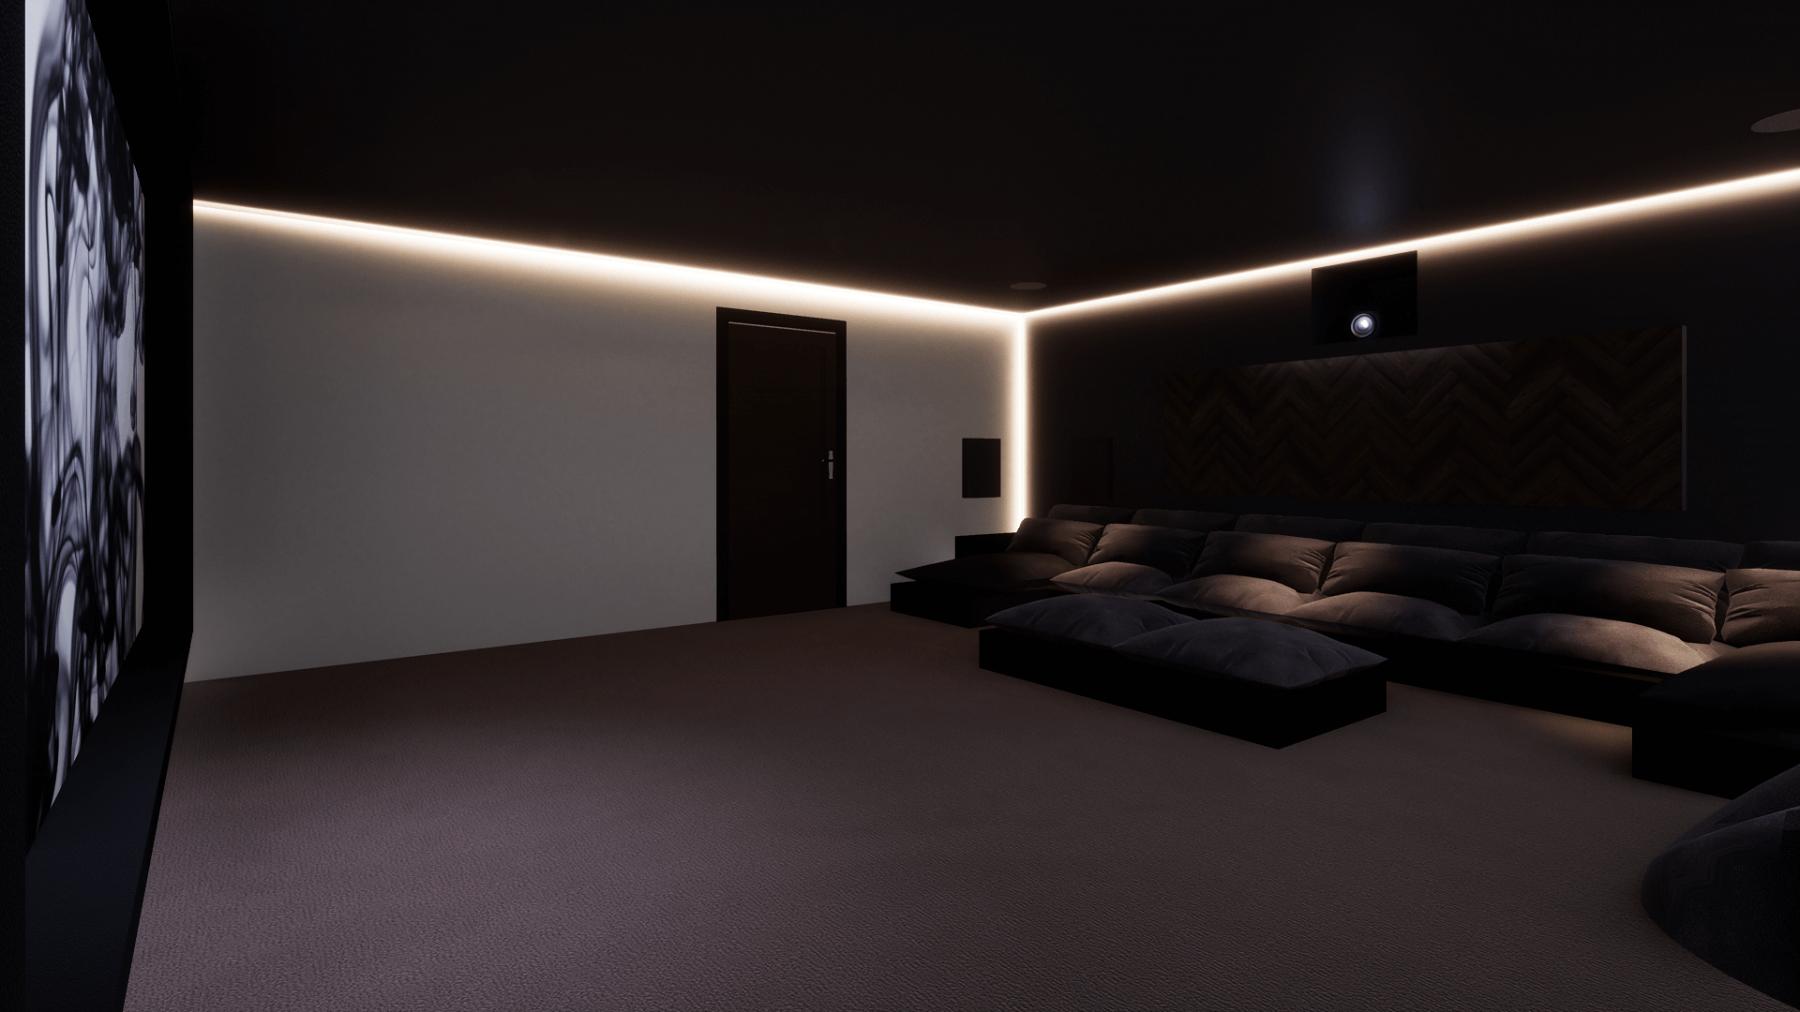 LED Cove Lighting in Cinema